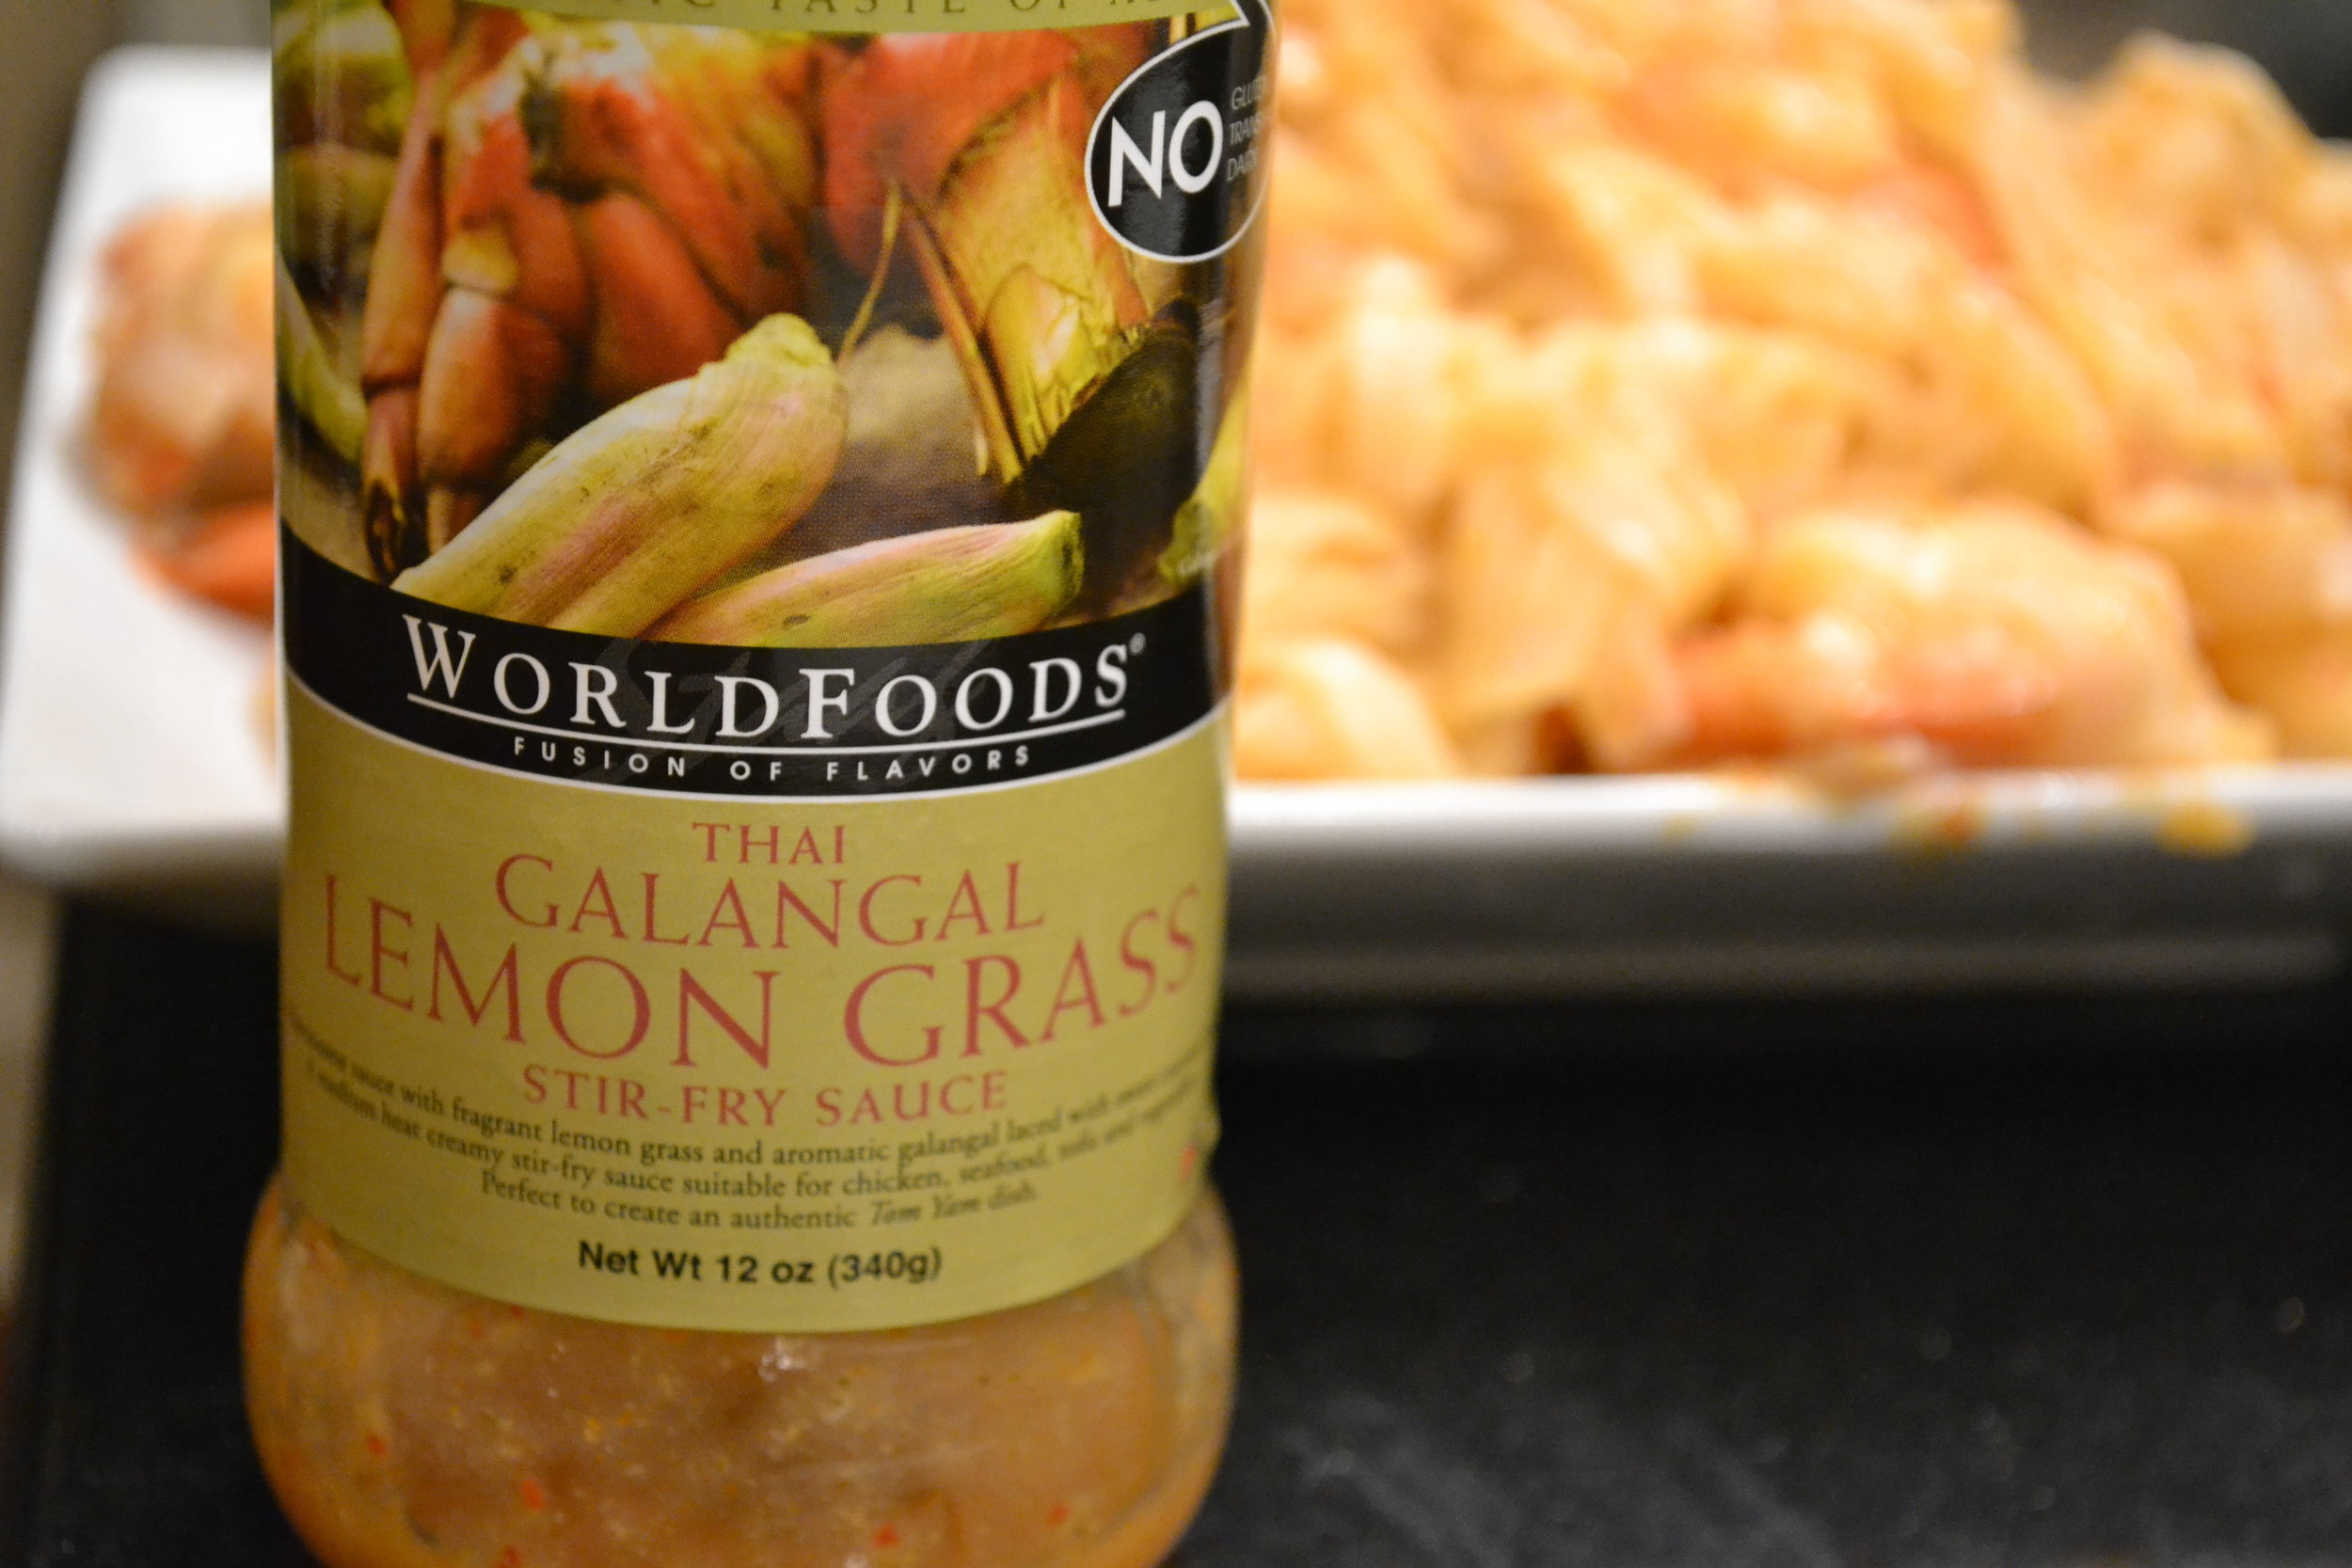 WorldFoods Galangal Lemon Grass Sauce